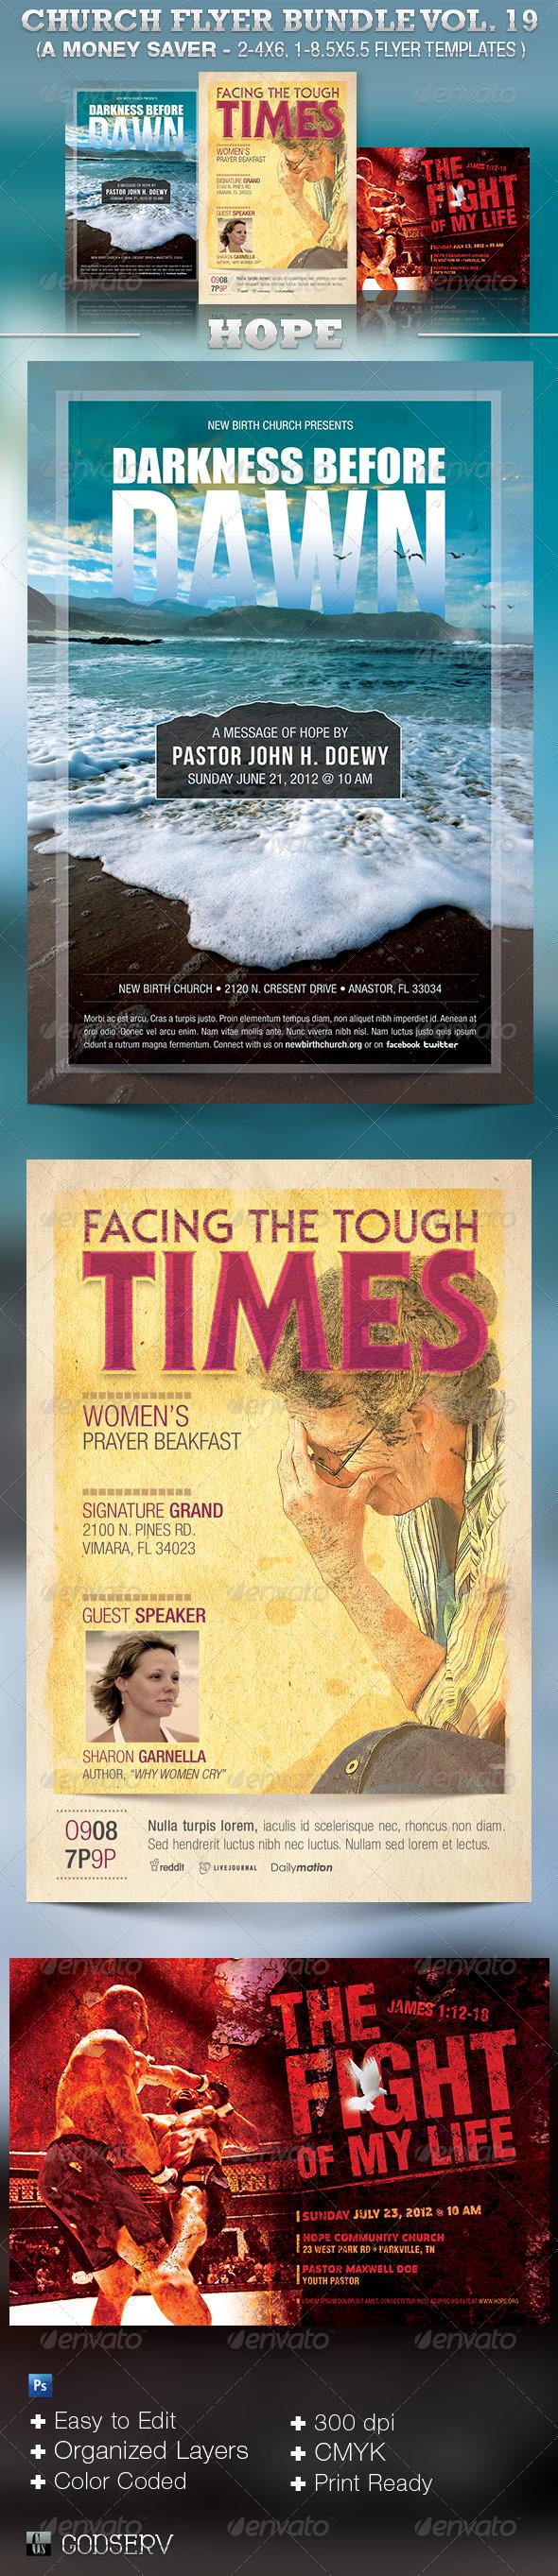 Hope Church Flyer Template Bundle Vol 19 - Church Flyers